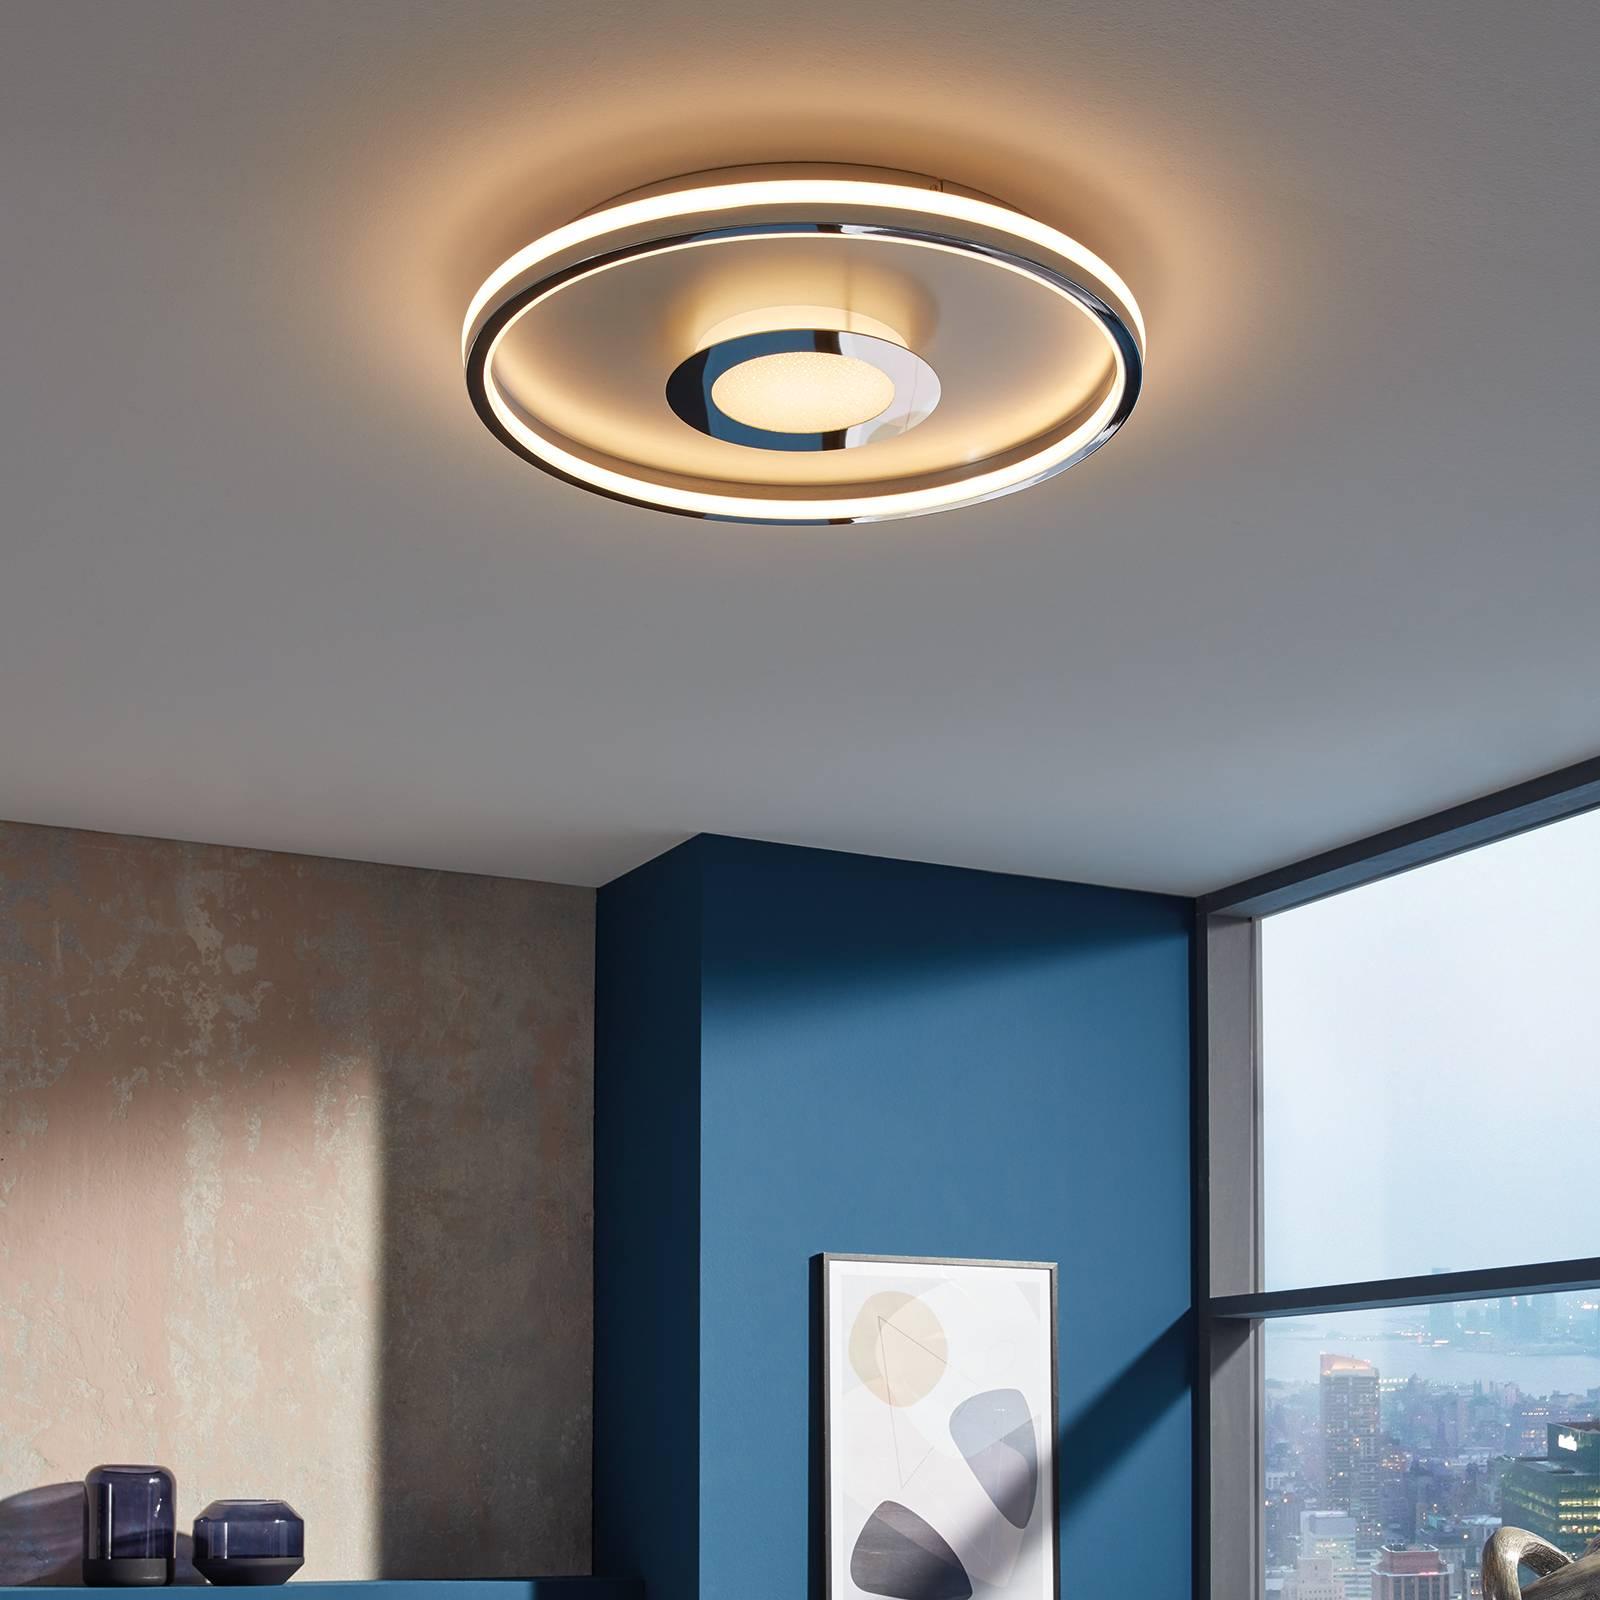 LED-kattovalaisin Bug pyöreä, kromi, 81 cm